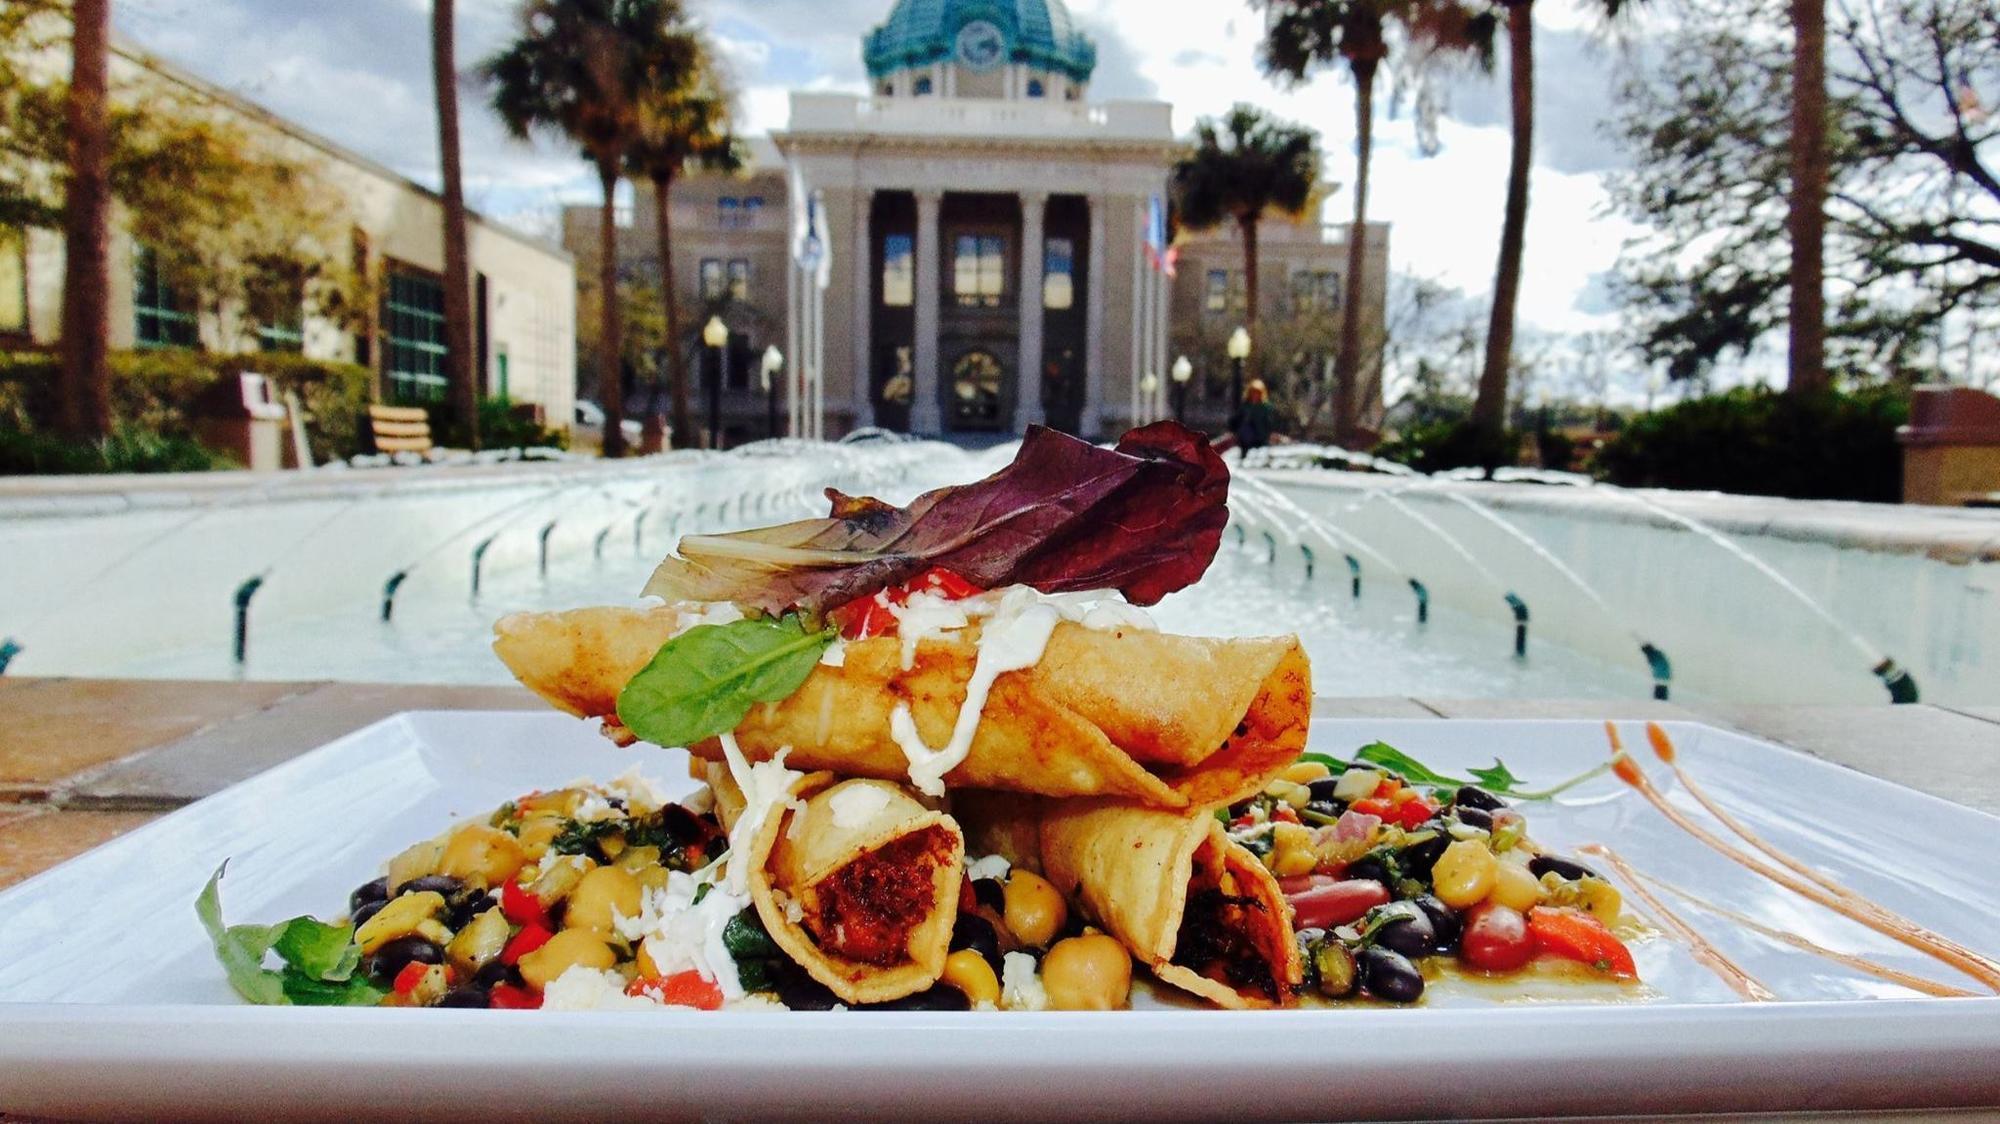 Deland S De La Vega Restaurant To Open New Spot In Oviedo Orlando Sentinel